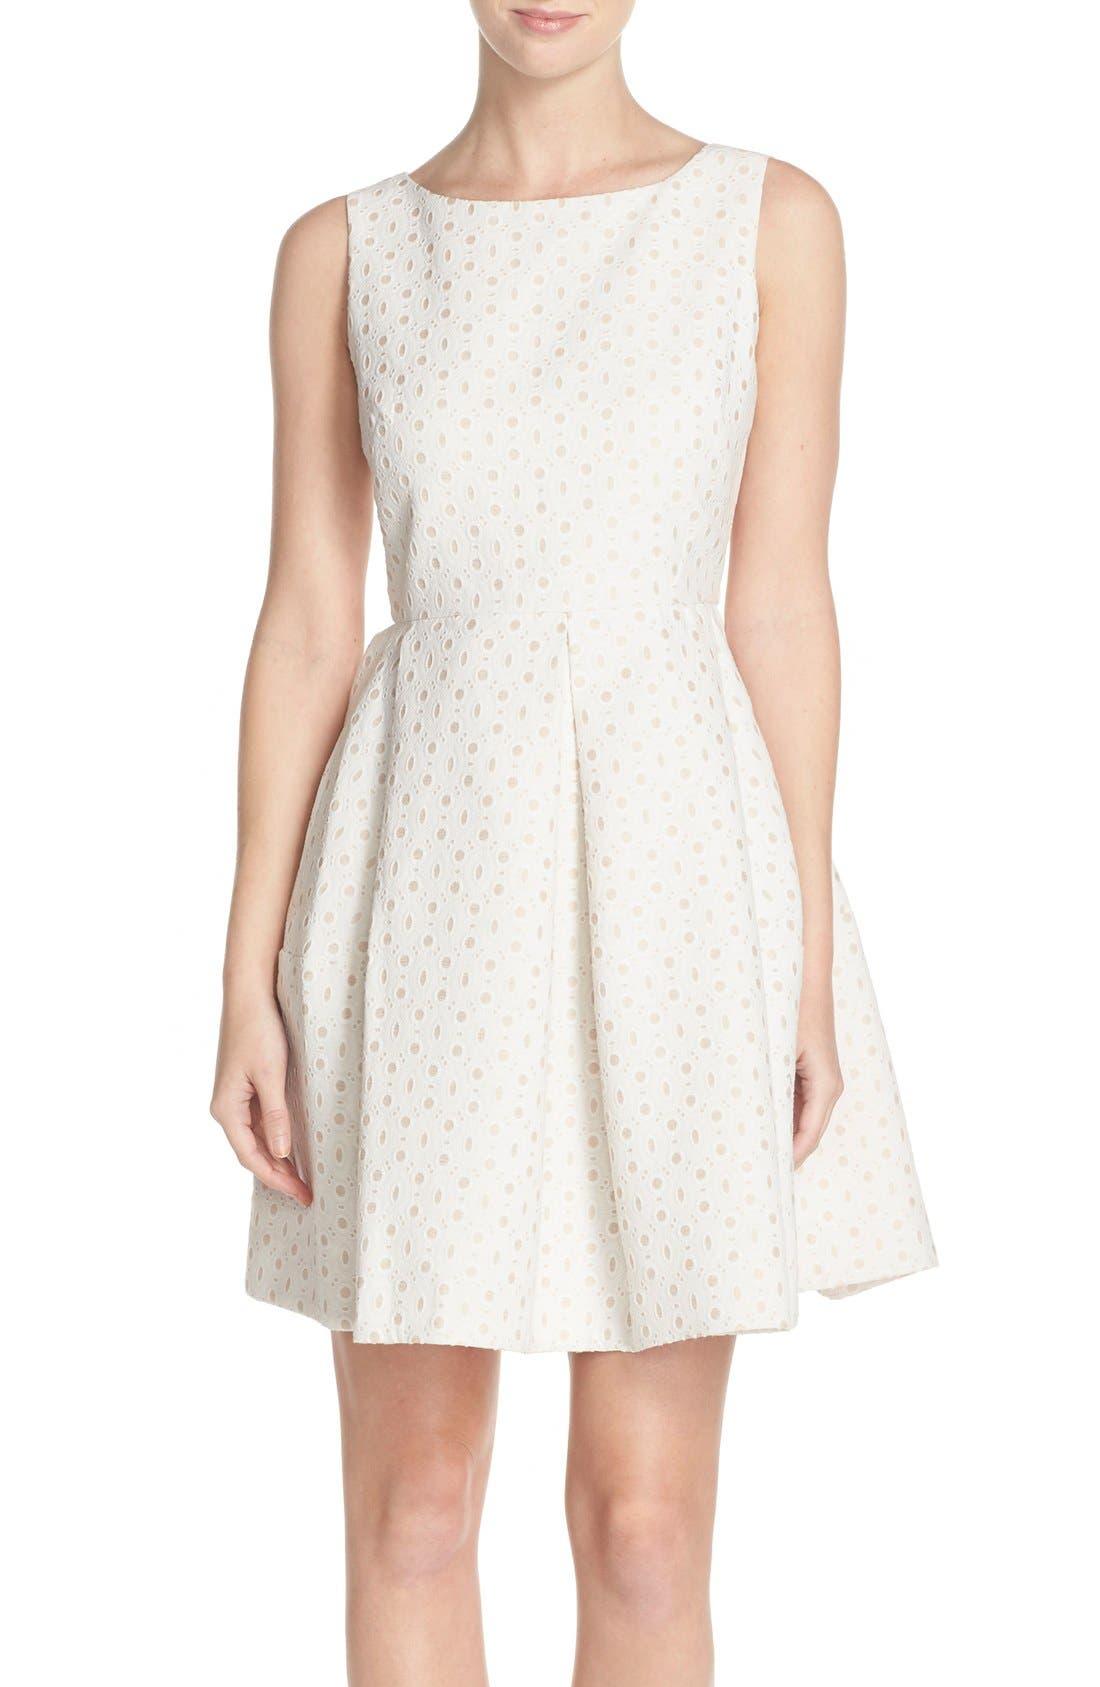 Main Image - Taylor Dresses Eyelet Fit & Flare Dress